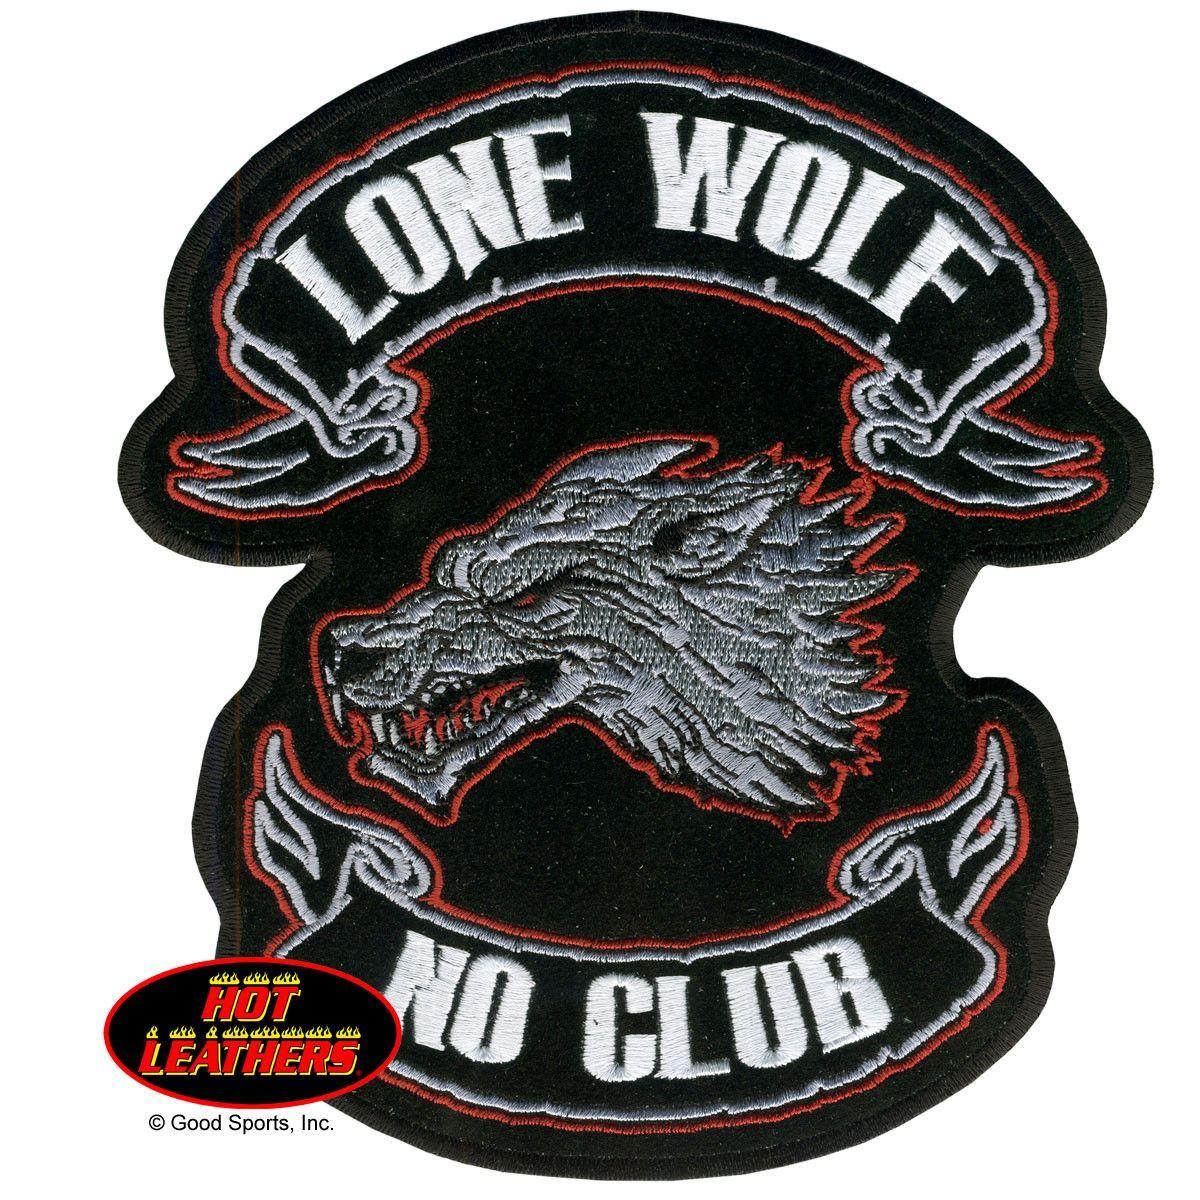 Hot Rod Road Wolf Werewolf Patch Embroidered Iron Jacket Applique Rockabilly